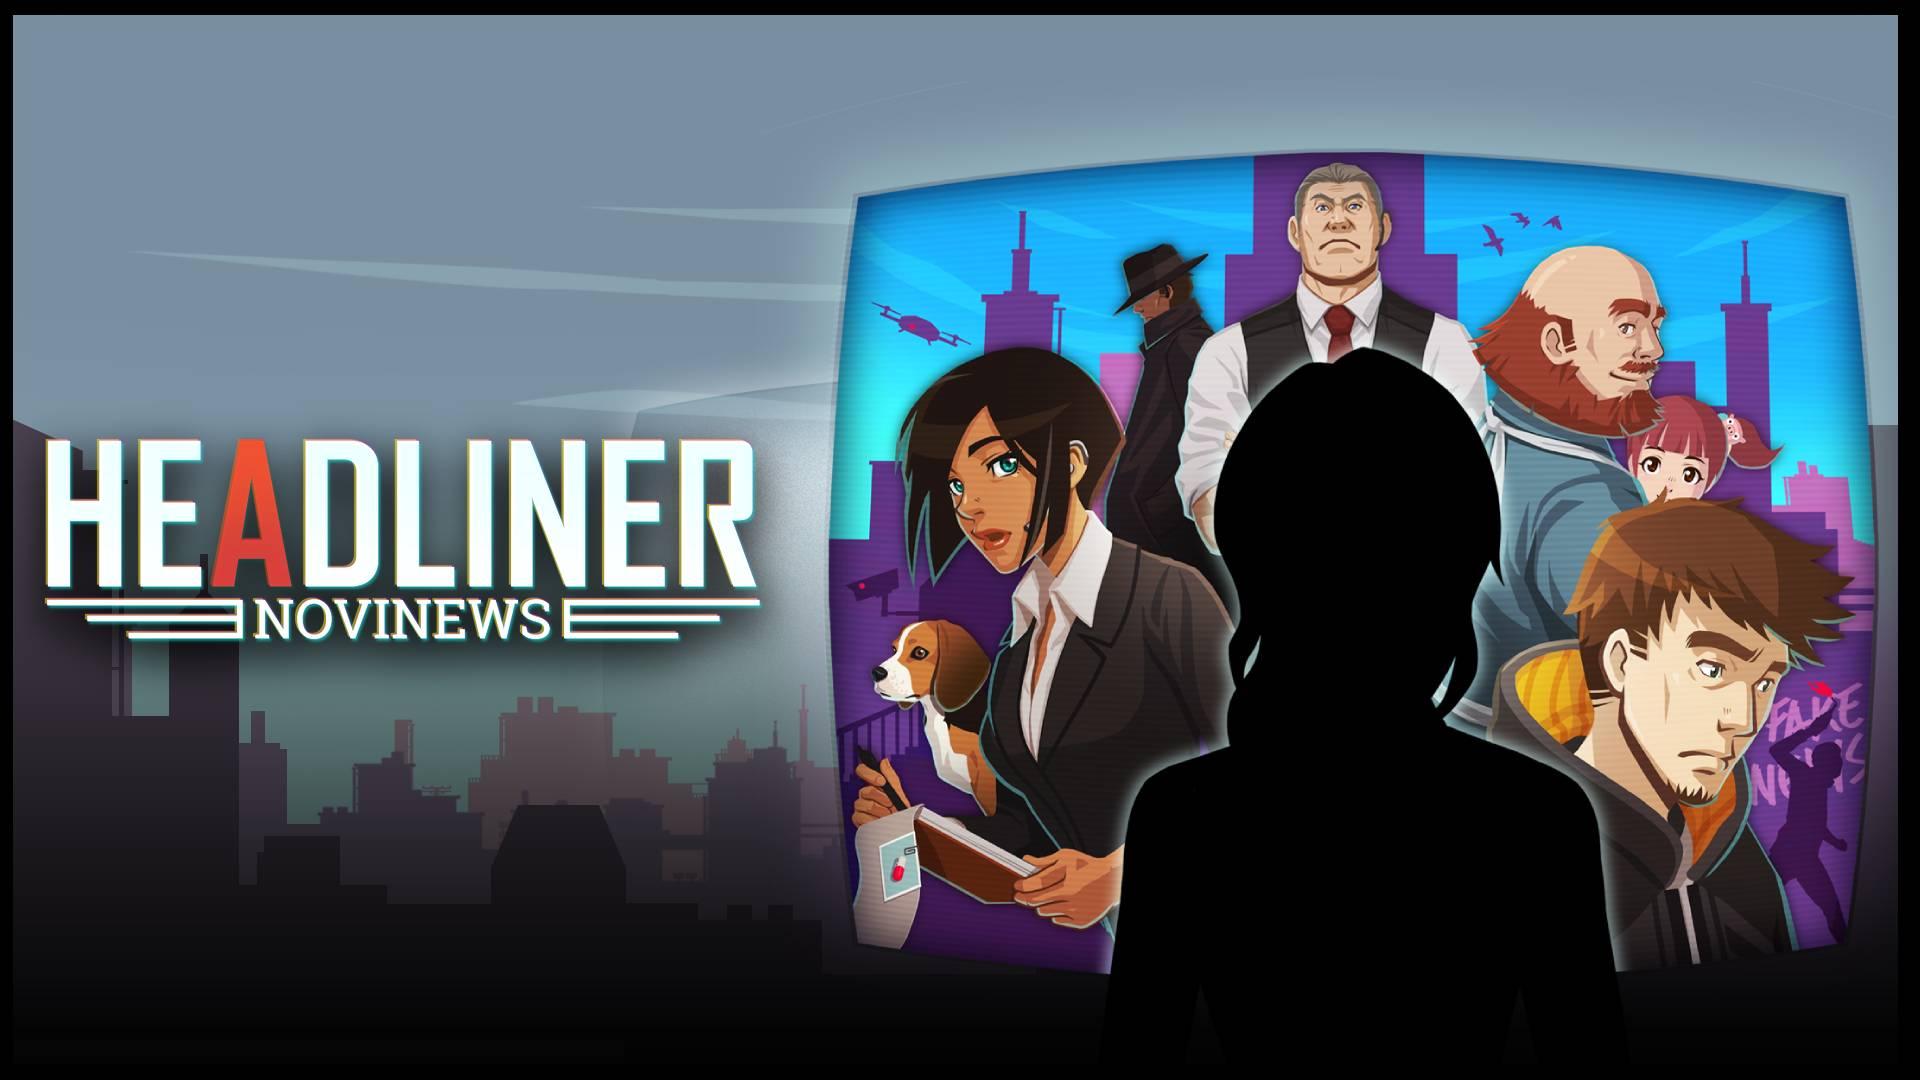 Headliner NoviNews PC Version Free Download